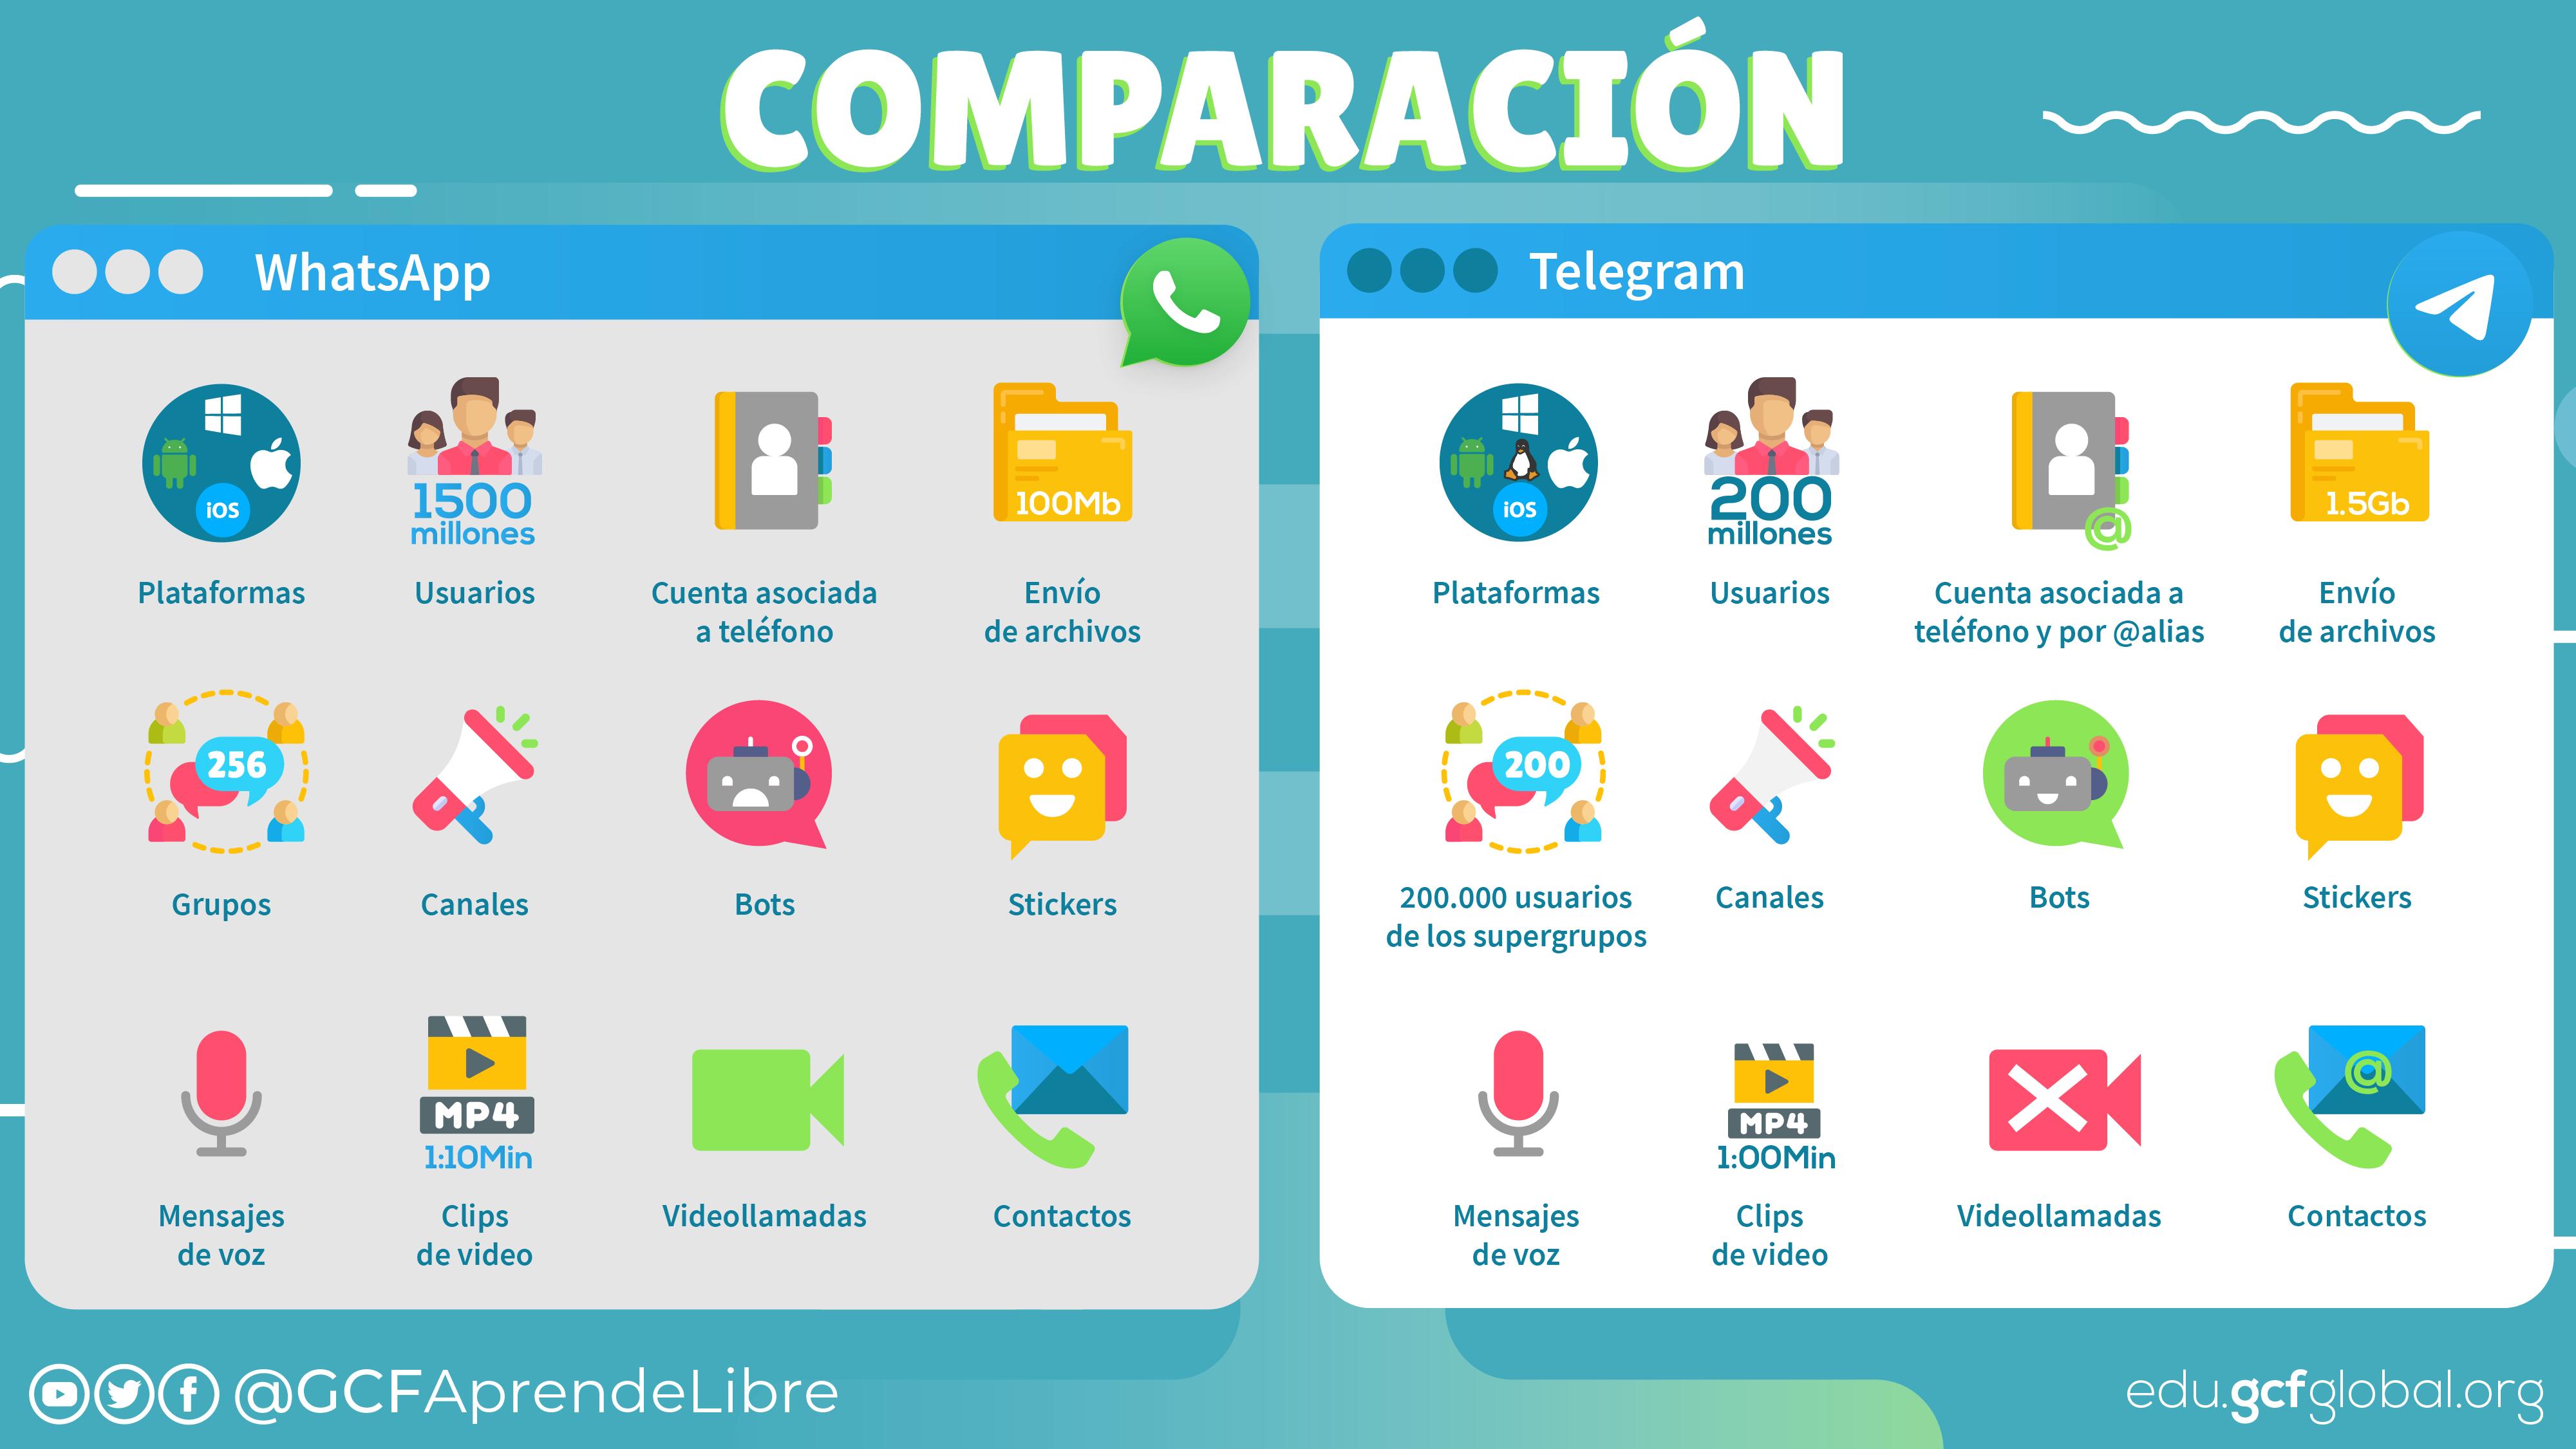 Comparación Telegram vs WhatsApp.